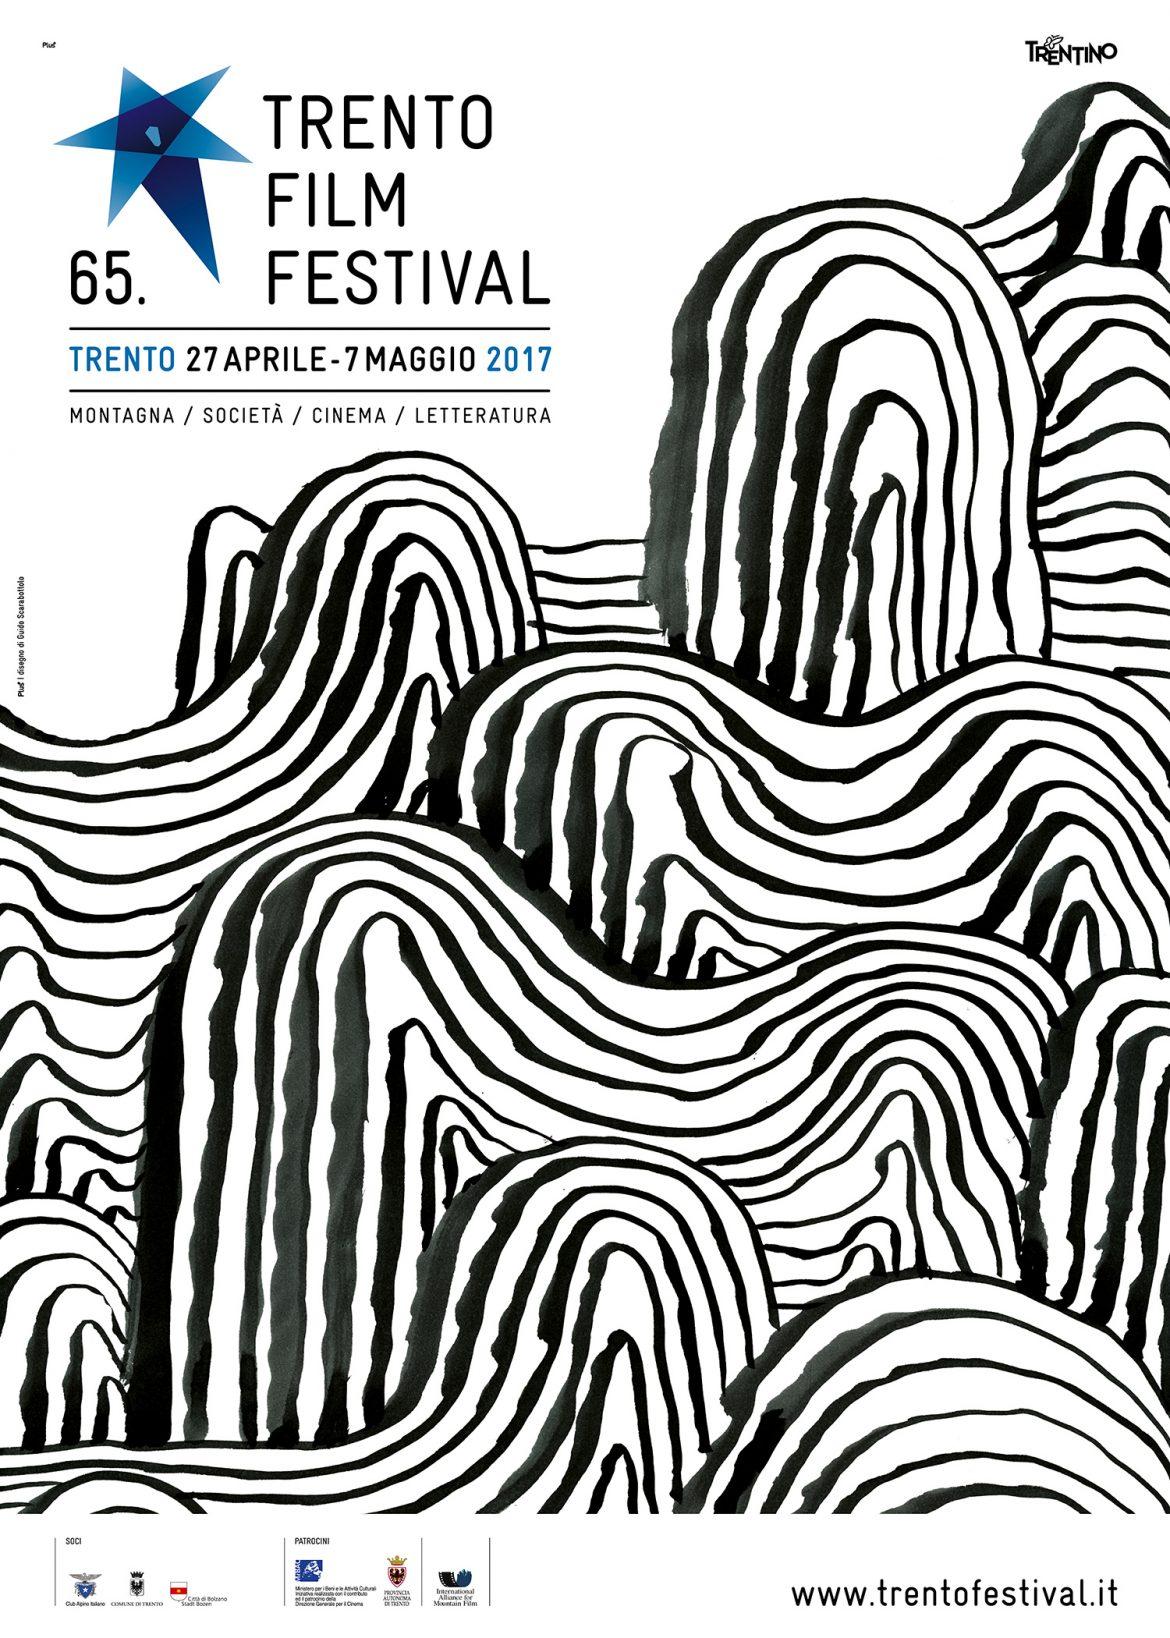 manifesto trento film festival 2017